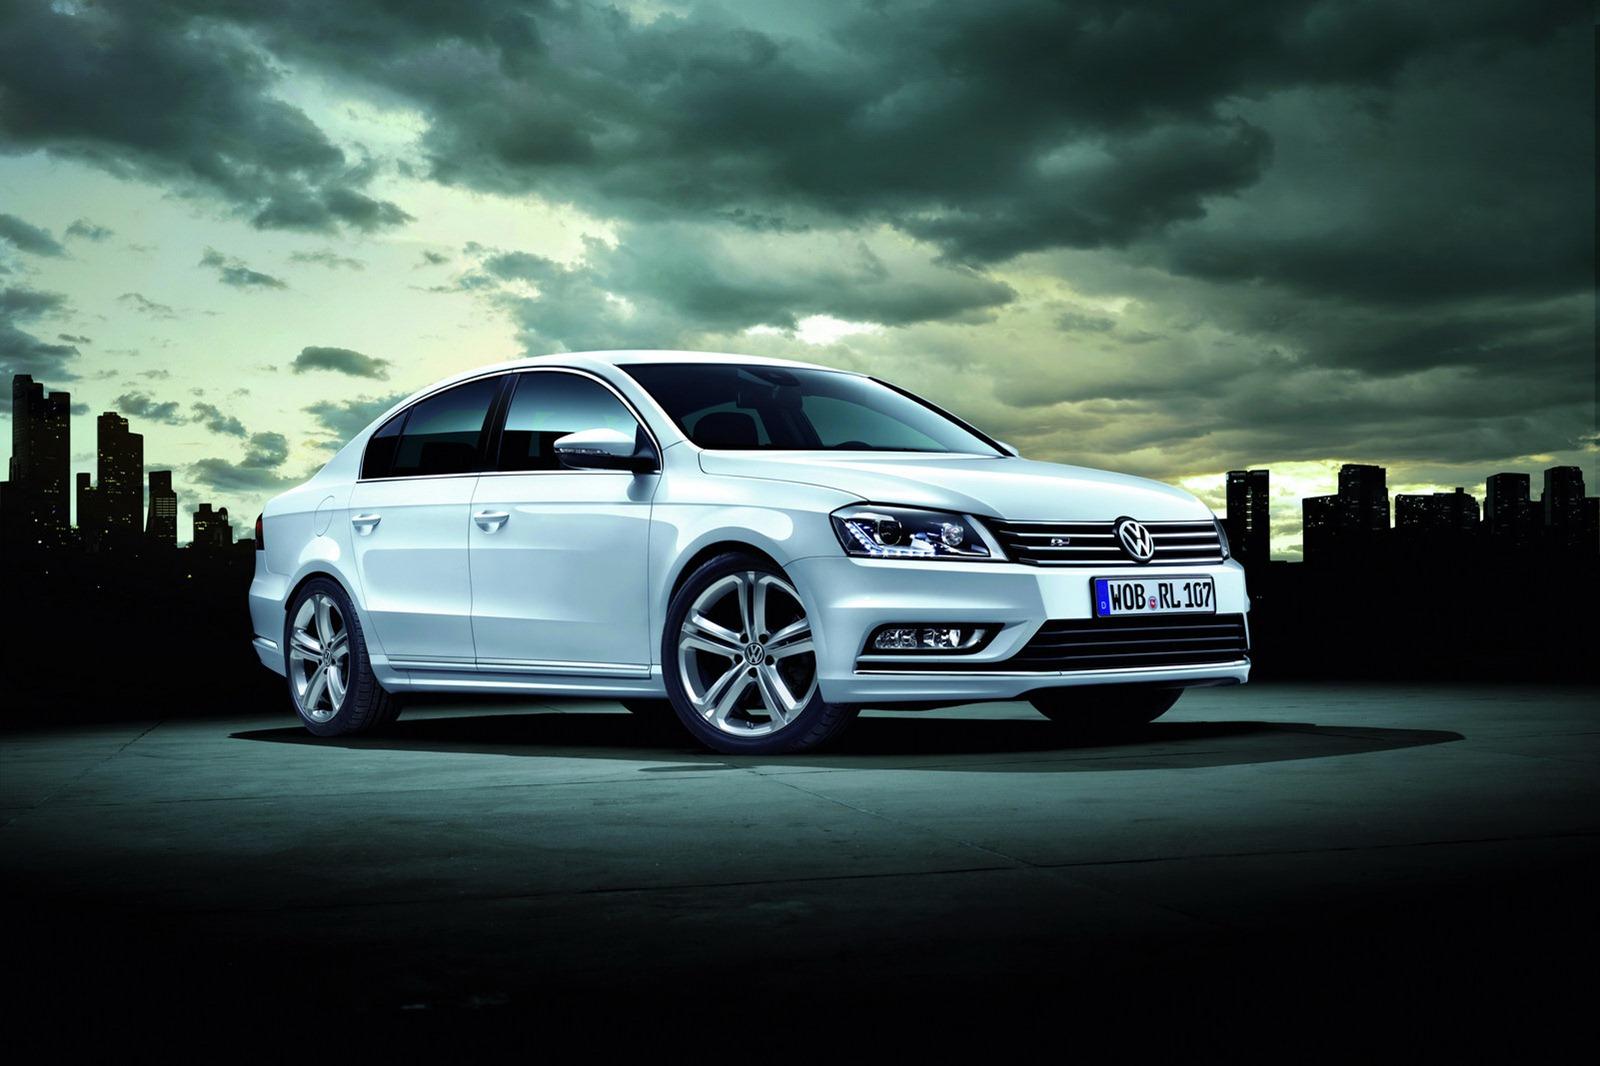 http://4.bp.blogspot.com/-MVlZV-1Y0dQ/T6OVpbgRTBI/AAAAAAAAgYE/vMEx4mgWEvE/s1600/2012-VW-Passat-R-Line-3%2525255B2%2525255D.jpg